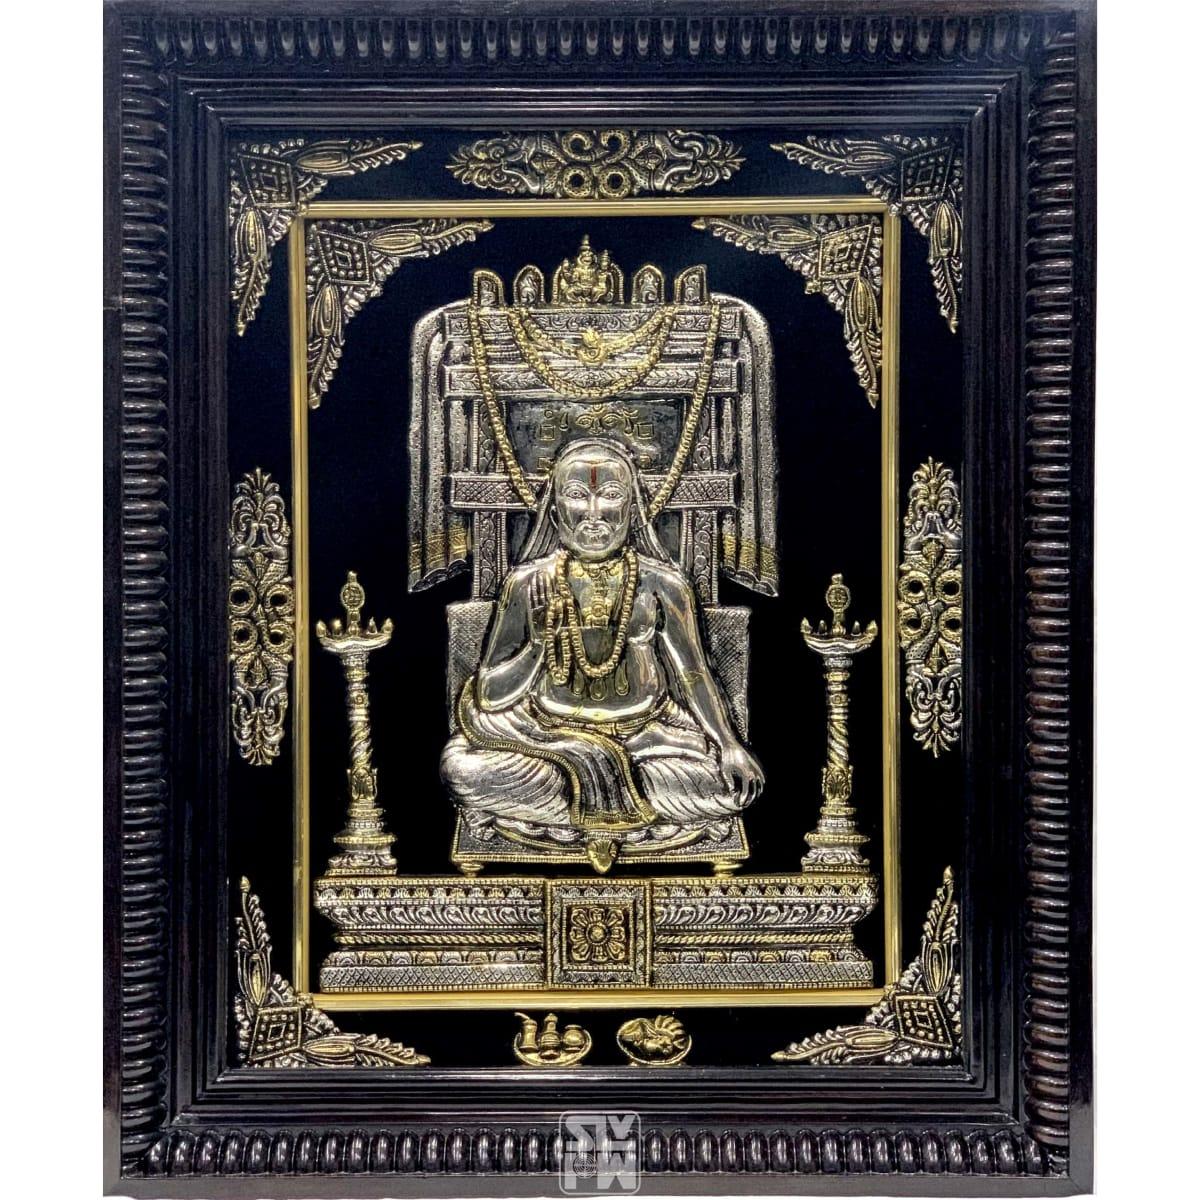 Raghavendra 19x23 Antique Finish